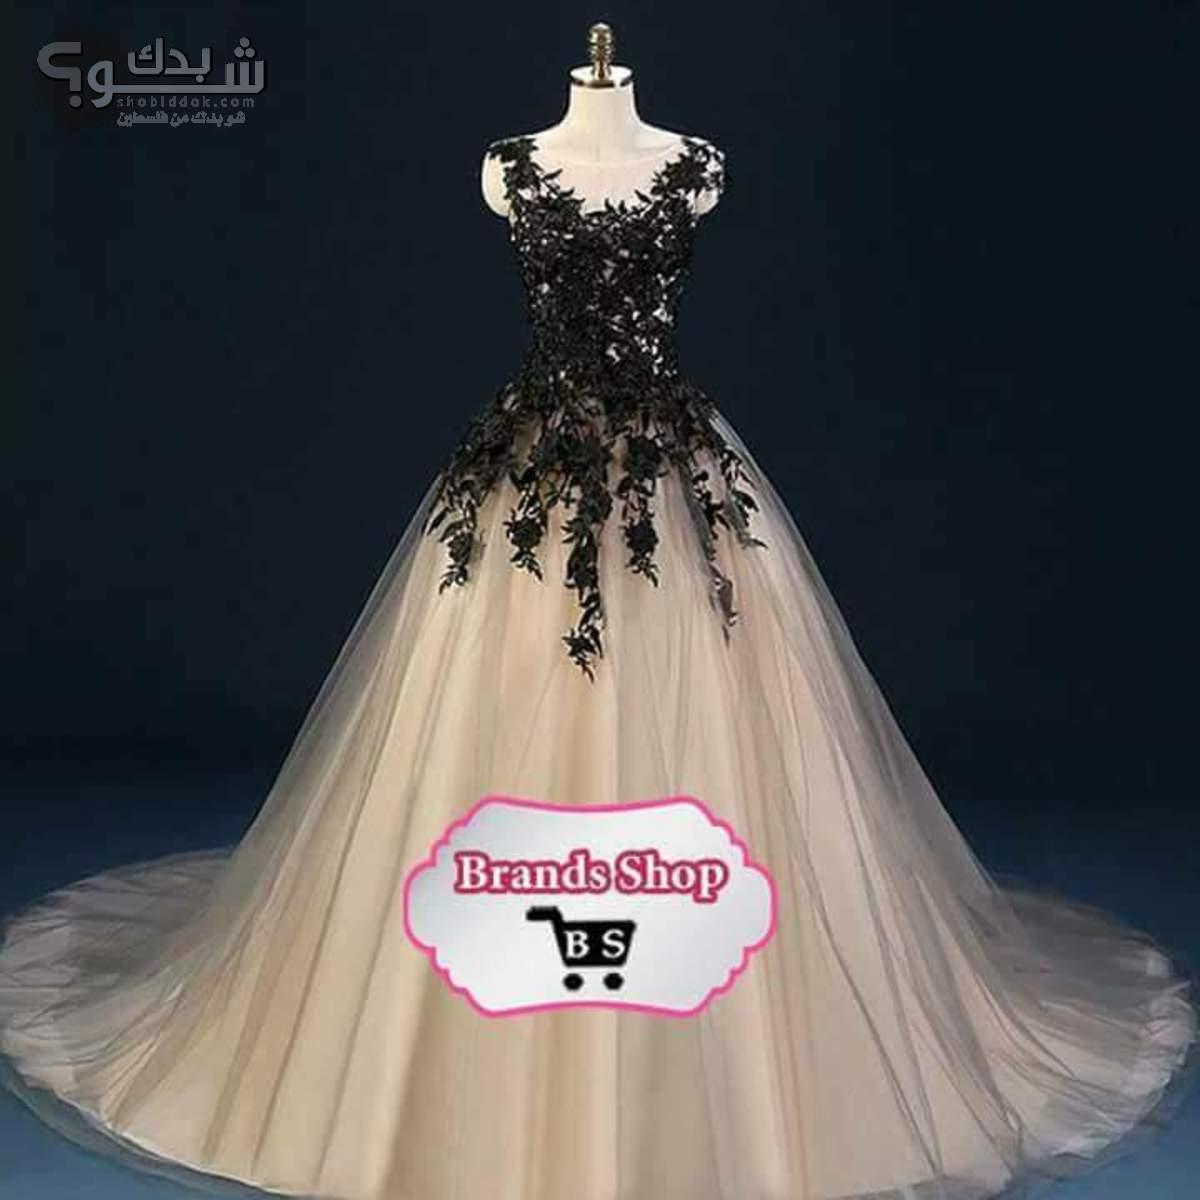 9c3160d57 الايبك لتاجير الفساتين | شو بدك من فلسطين؟